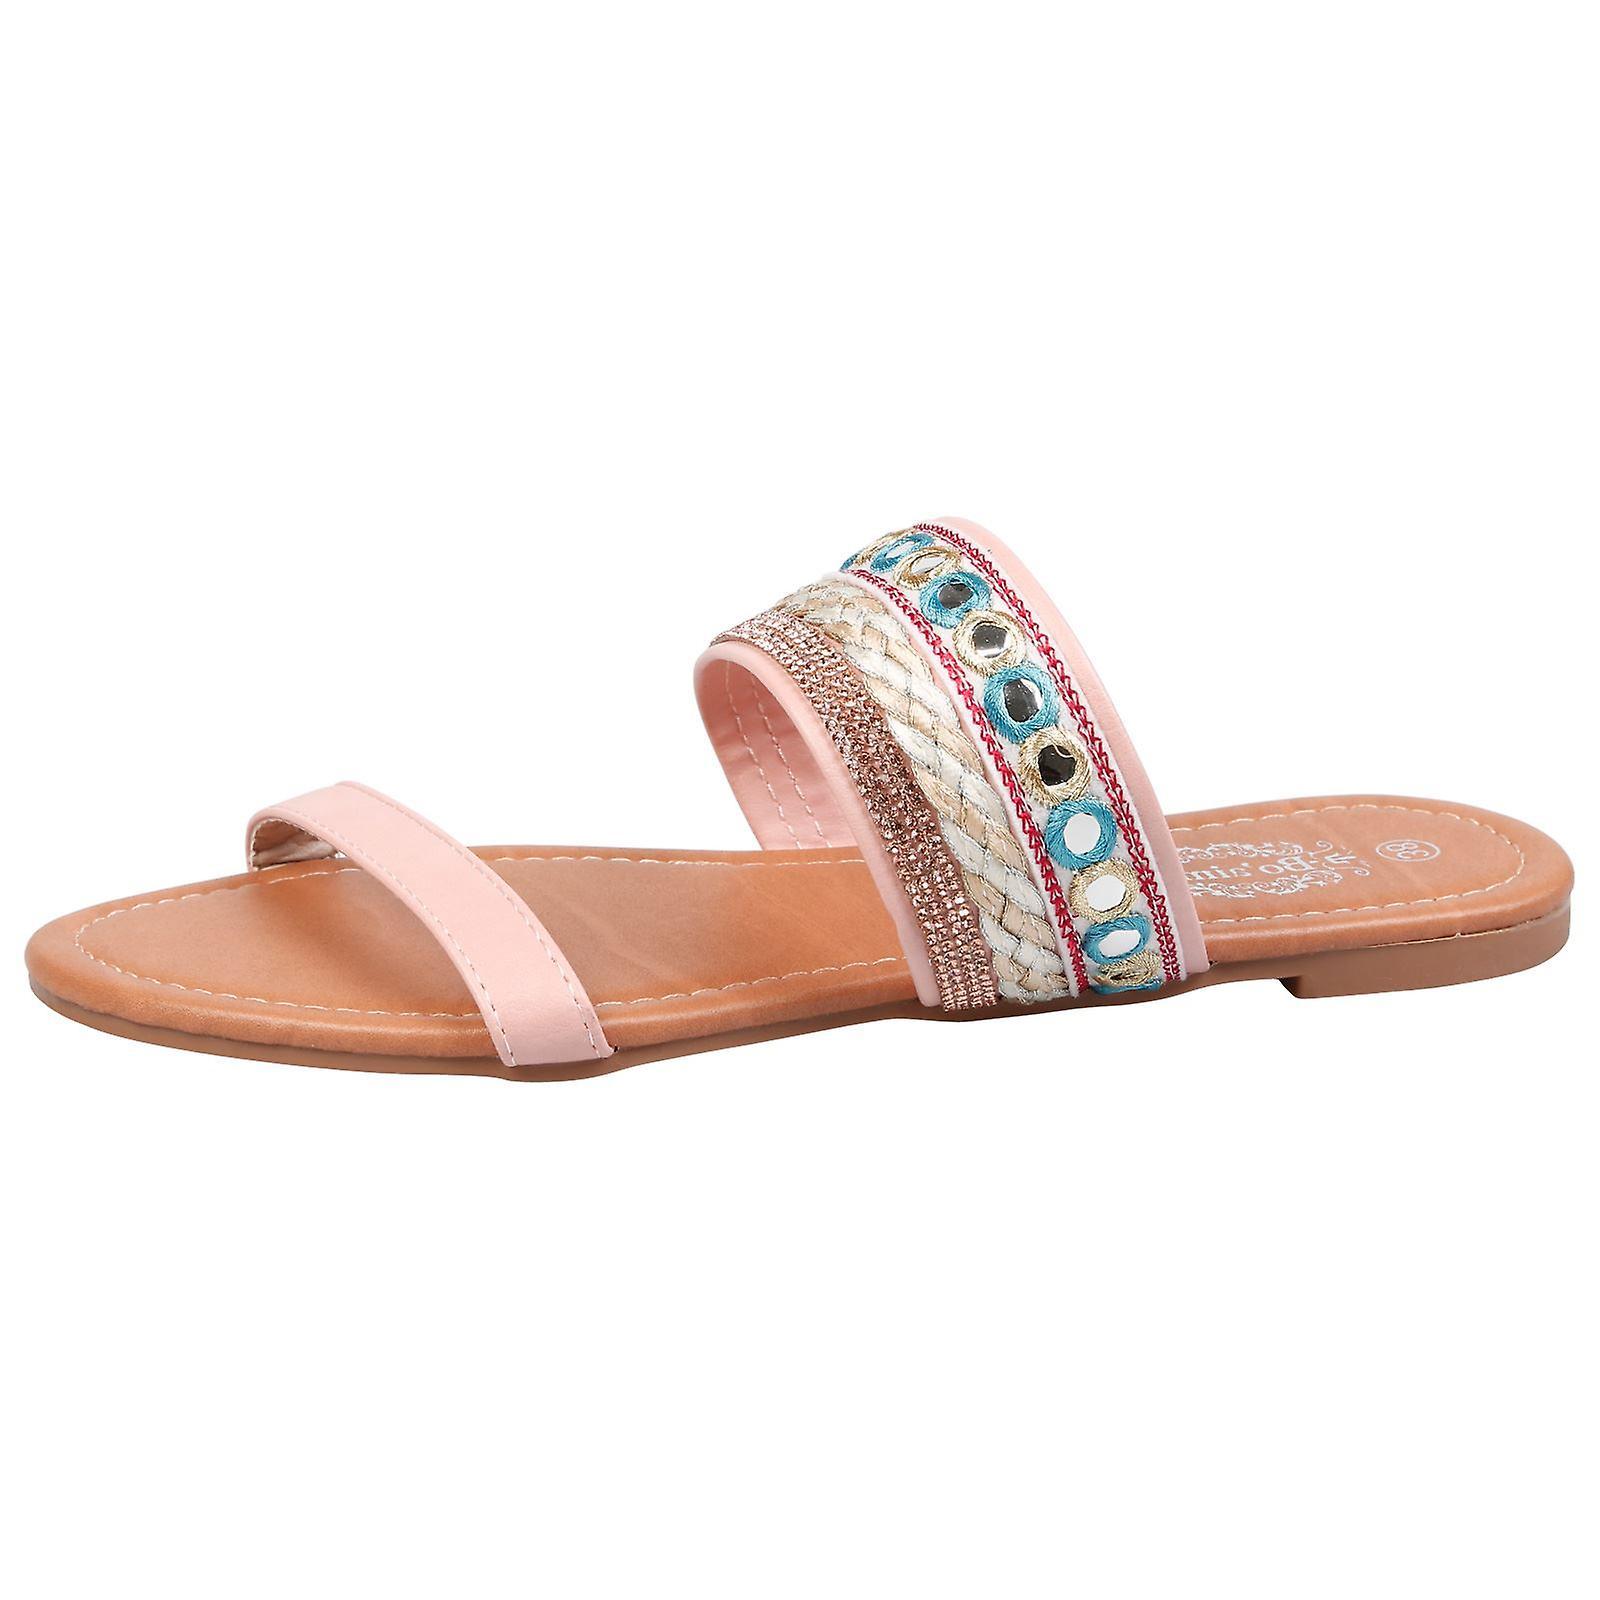 Tascha Womens Flats Diamante Embellished Slip On Sandals